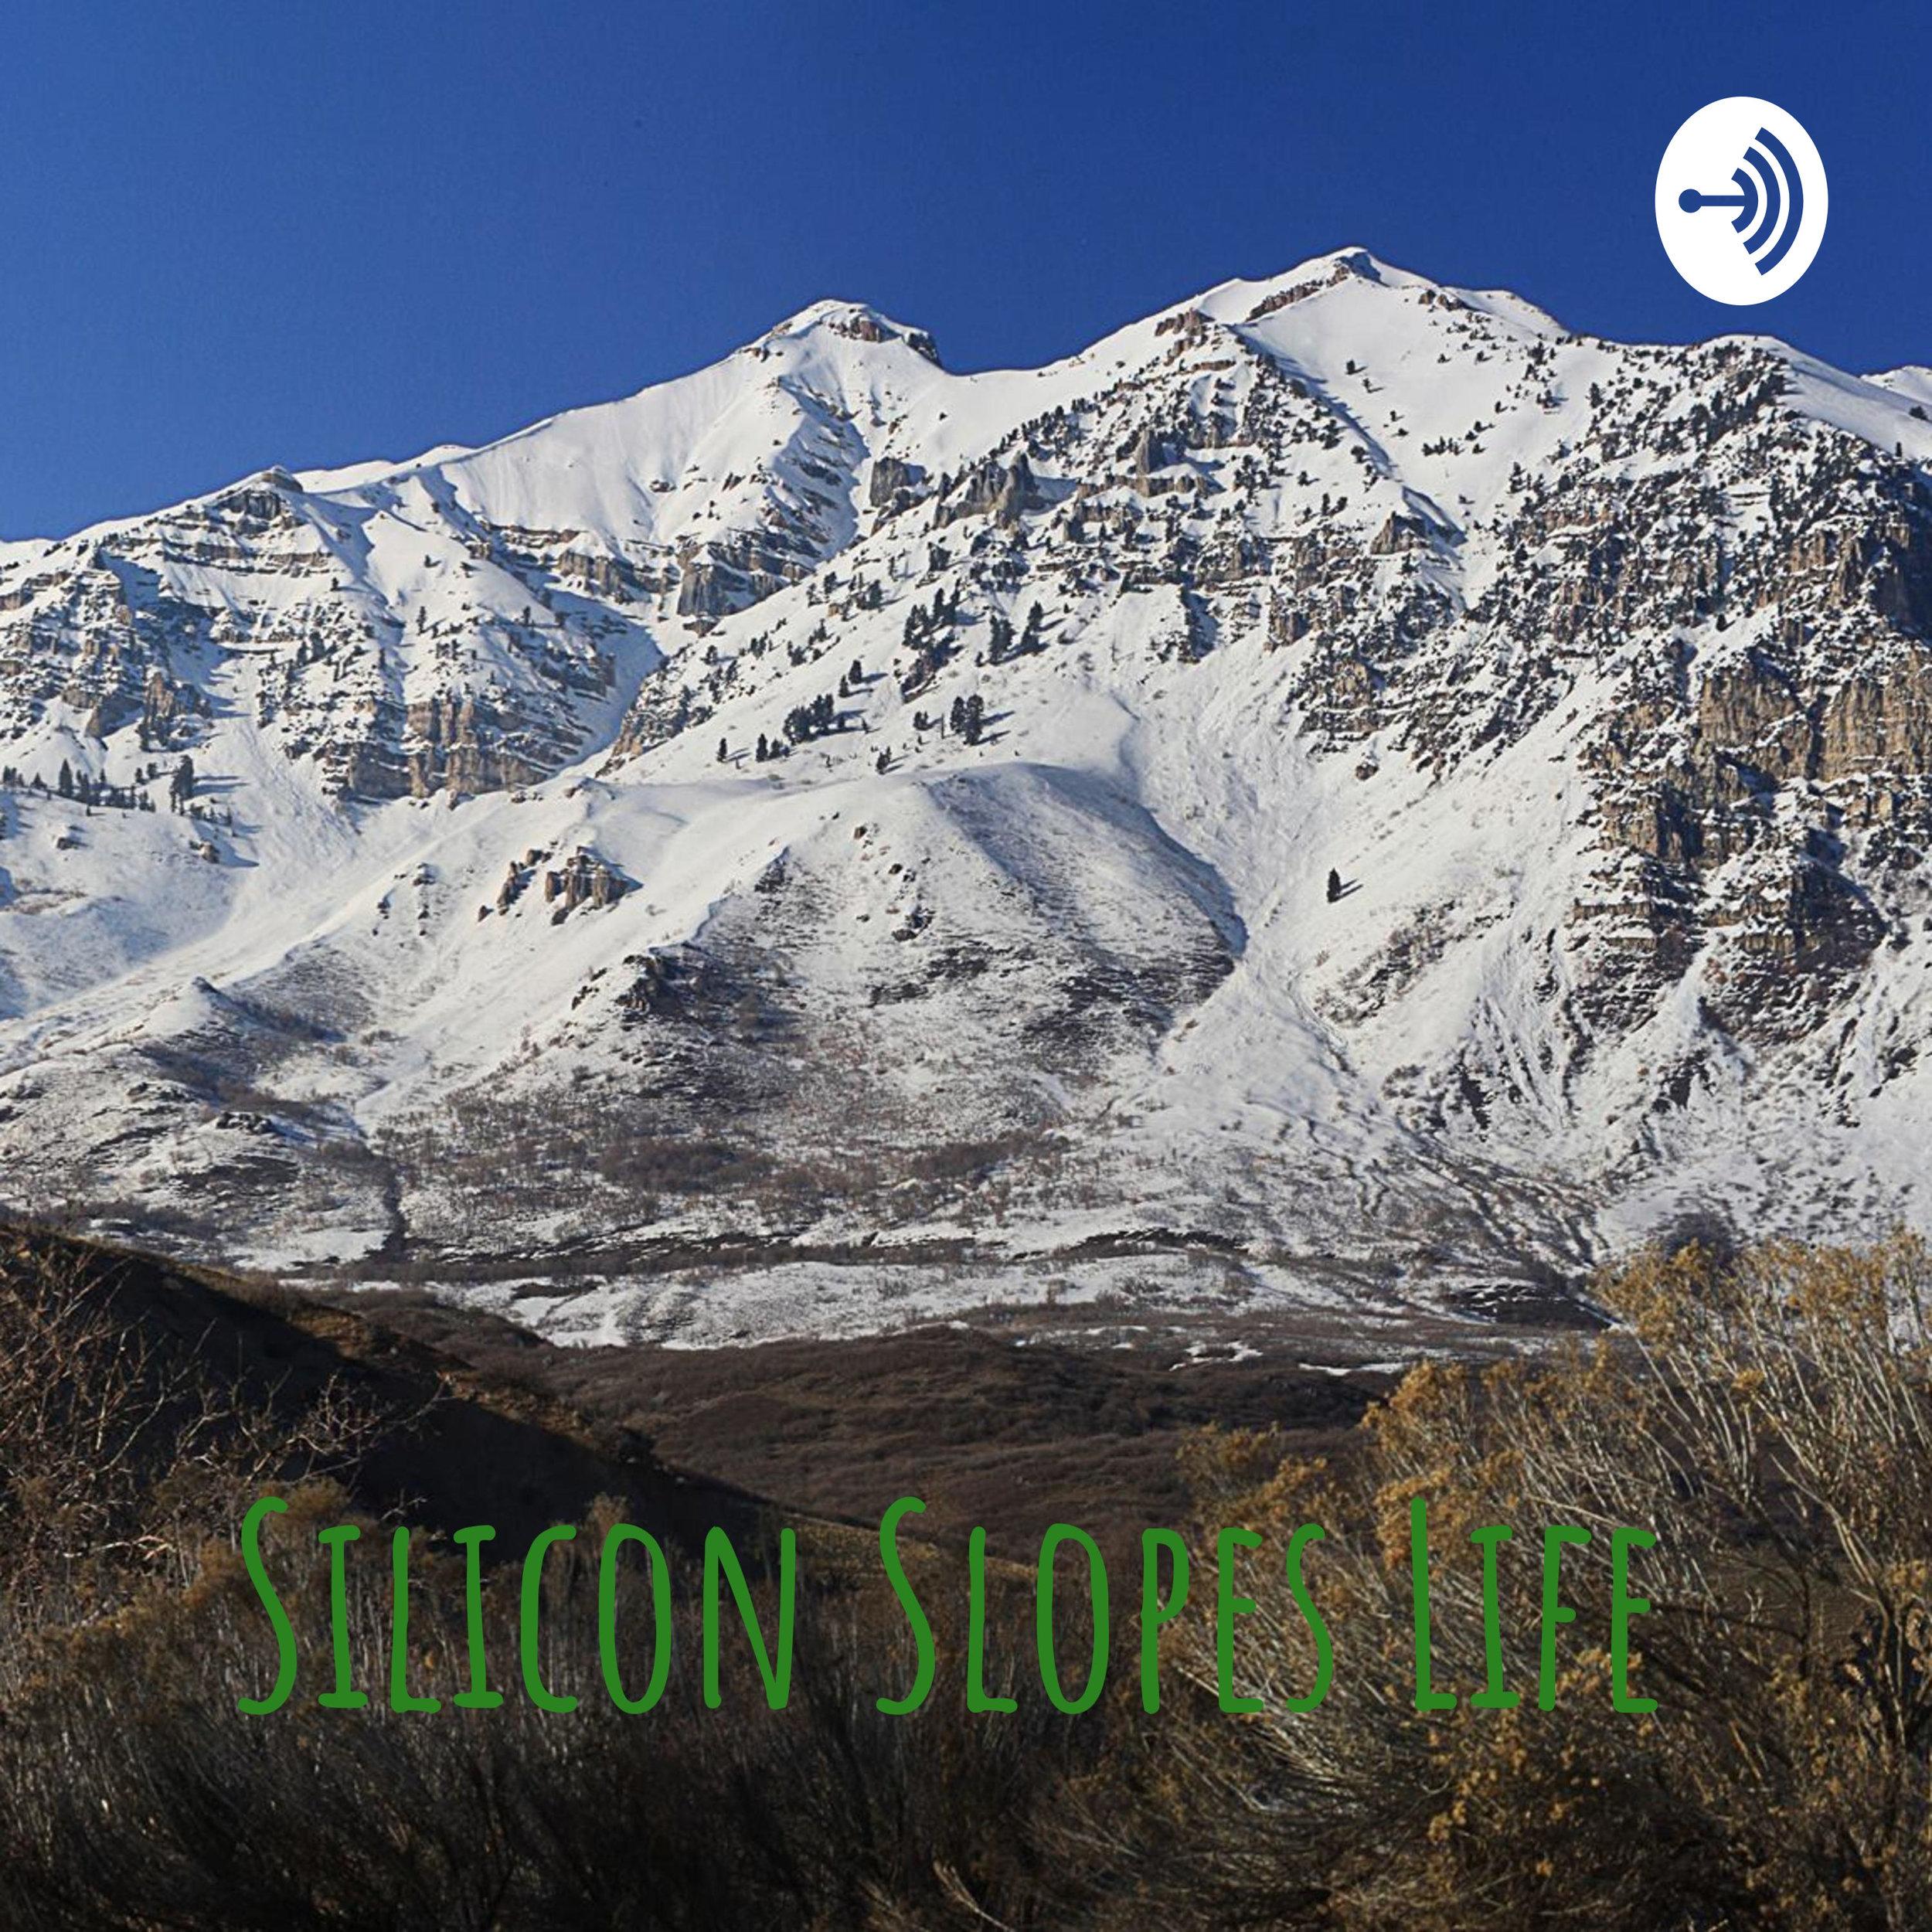 silicon slopes life cover.jpg